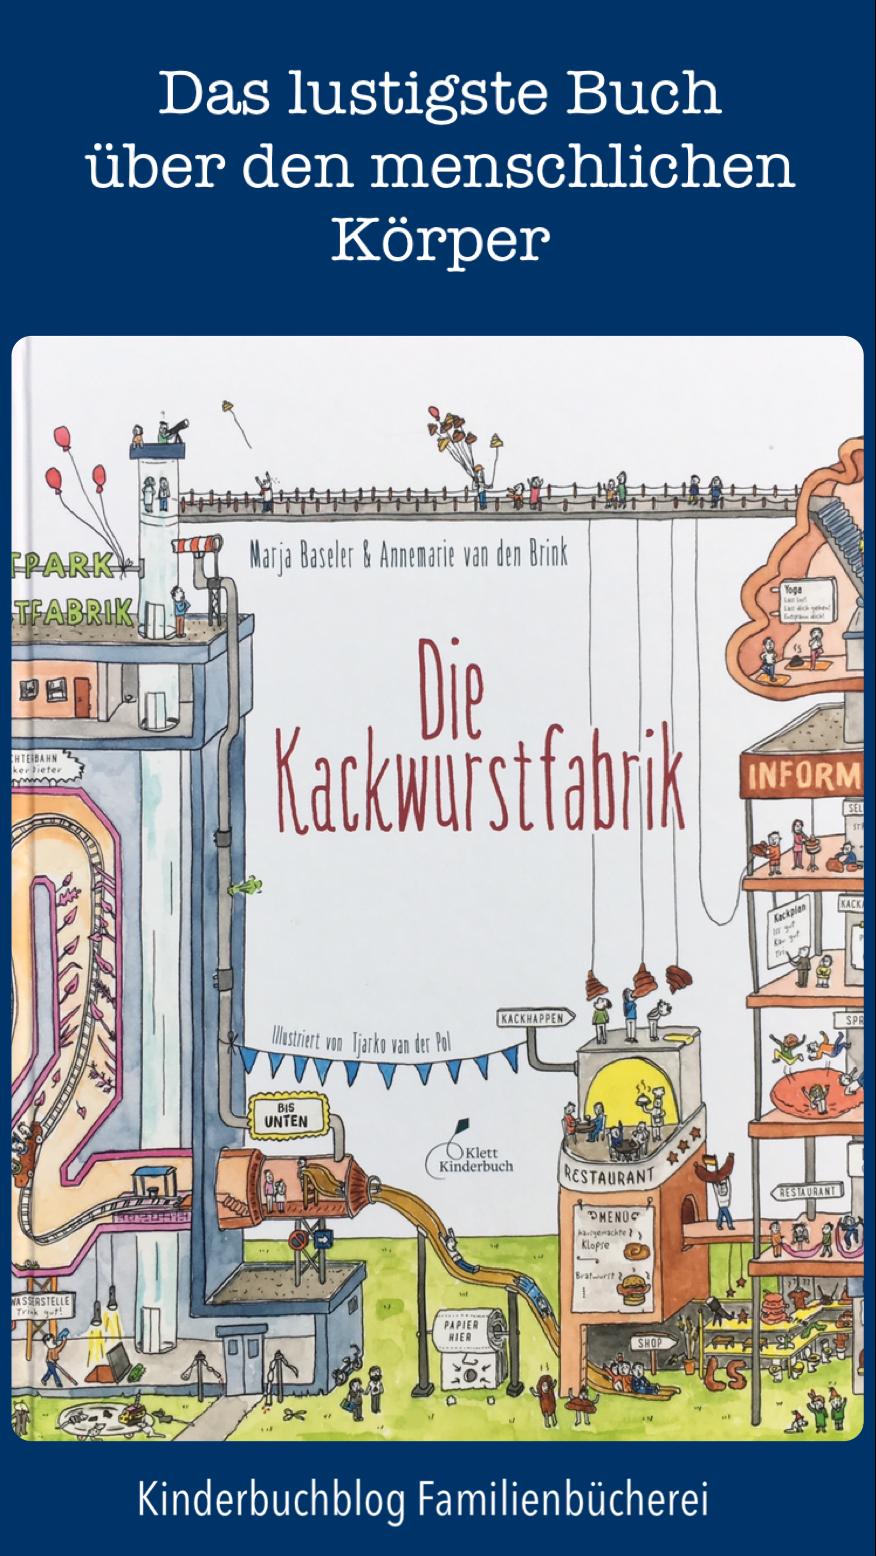 Pin Auf Kinderbuchblog Familienbuecherei Unsere Kinderbuchtipps Fur Euch